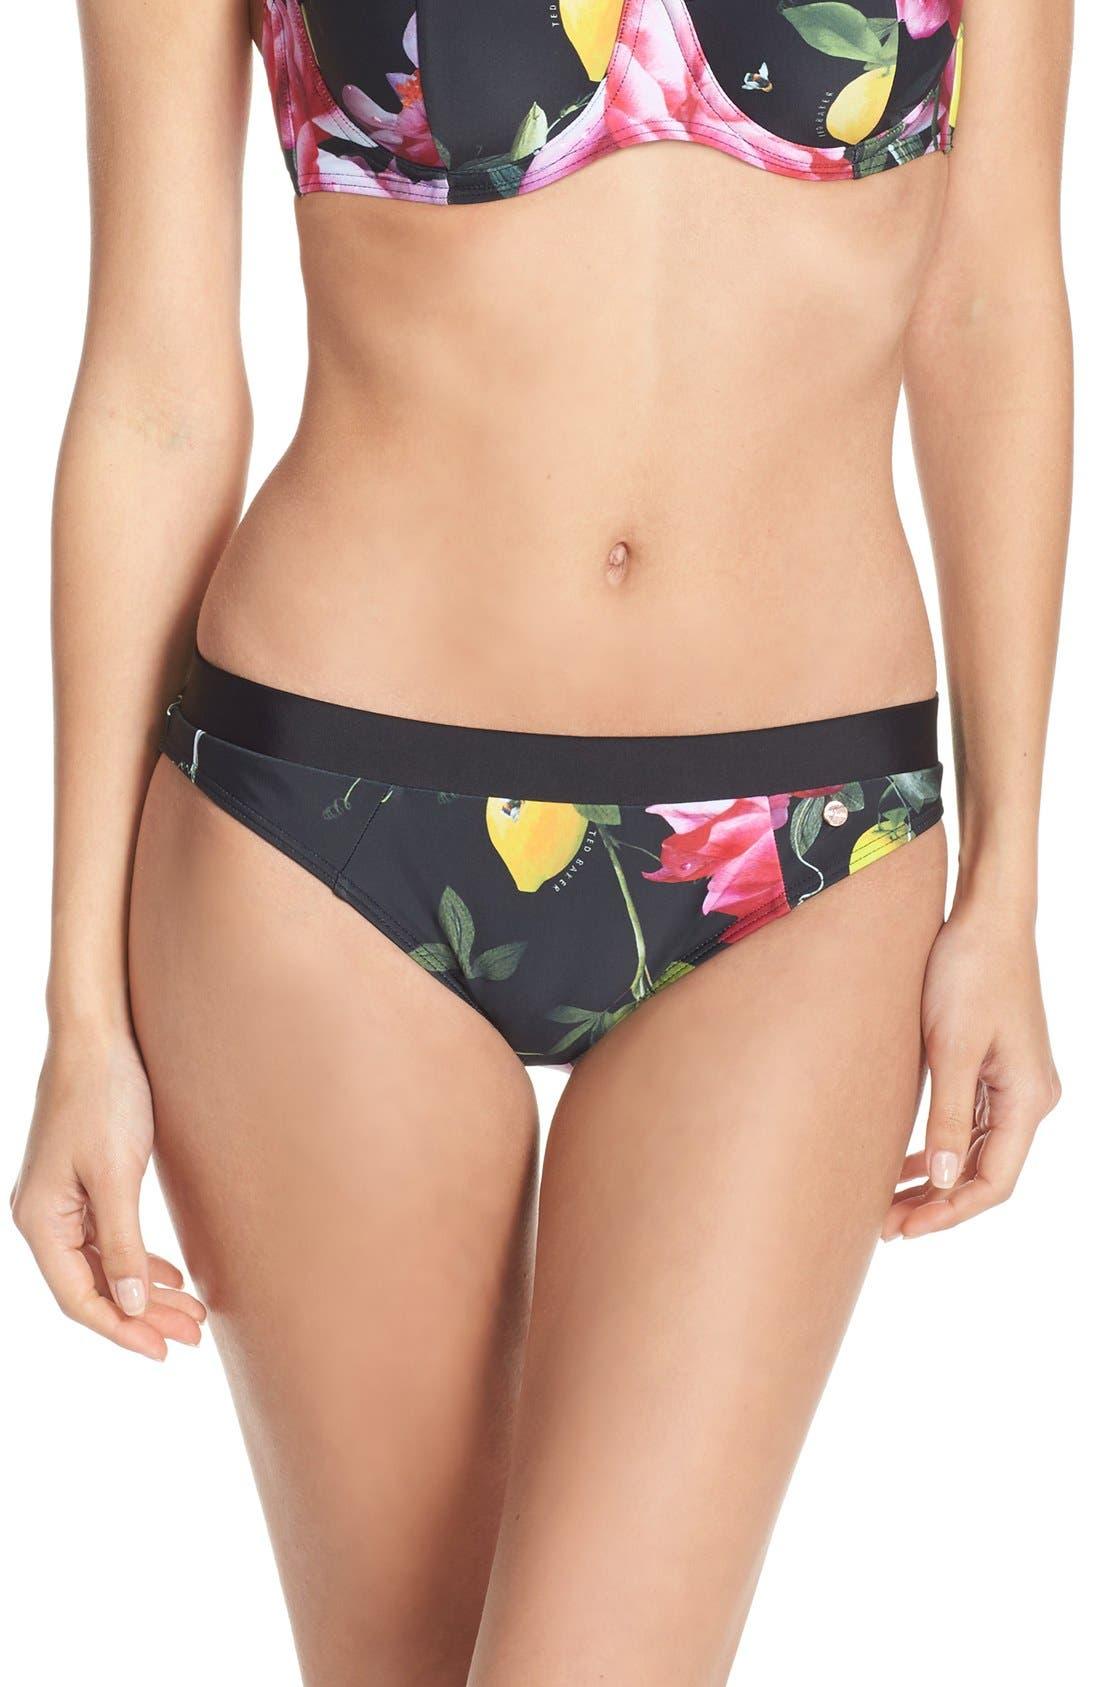 TED BAKER LONDON 'Citrus Bloom' Bikini Bottoms